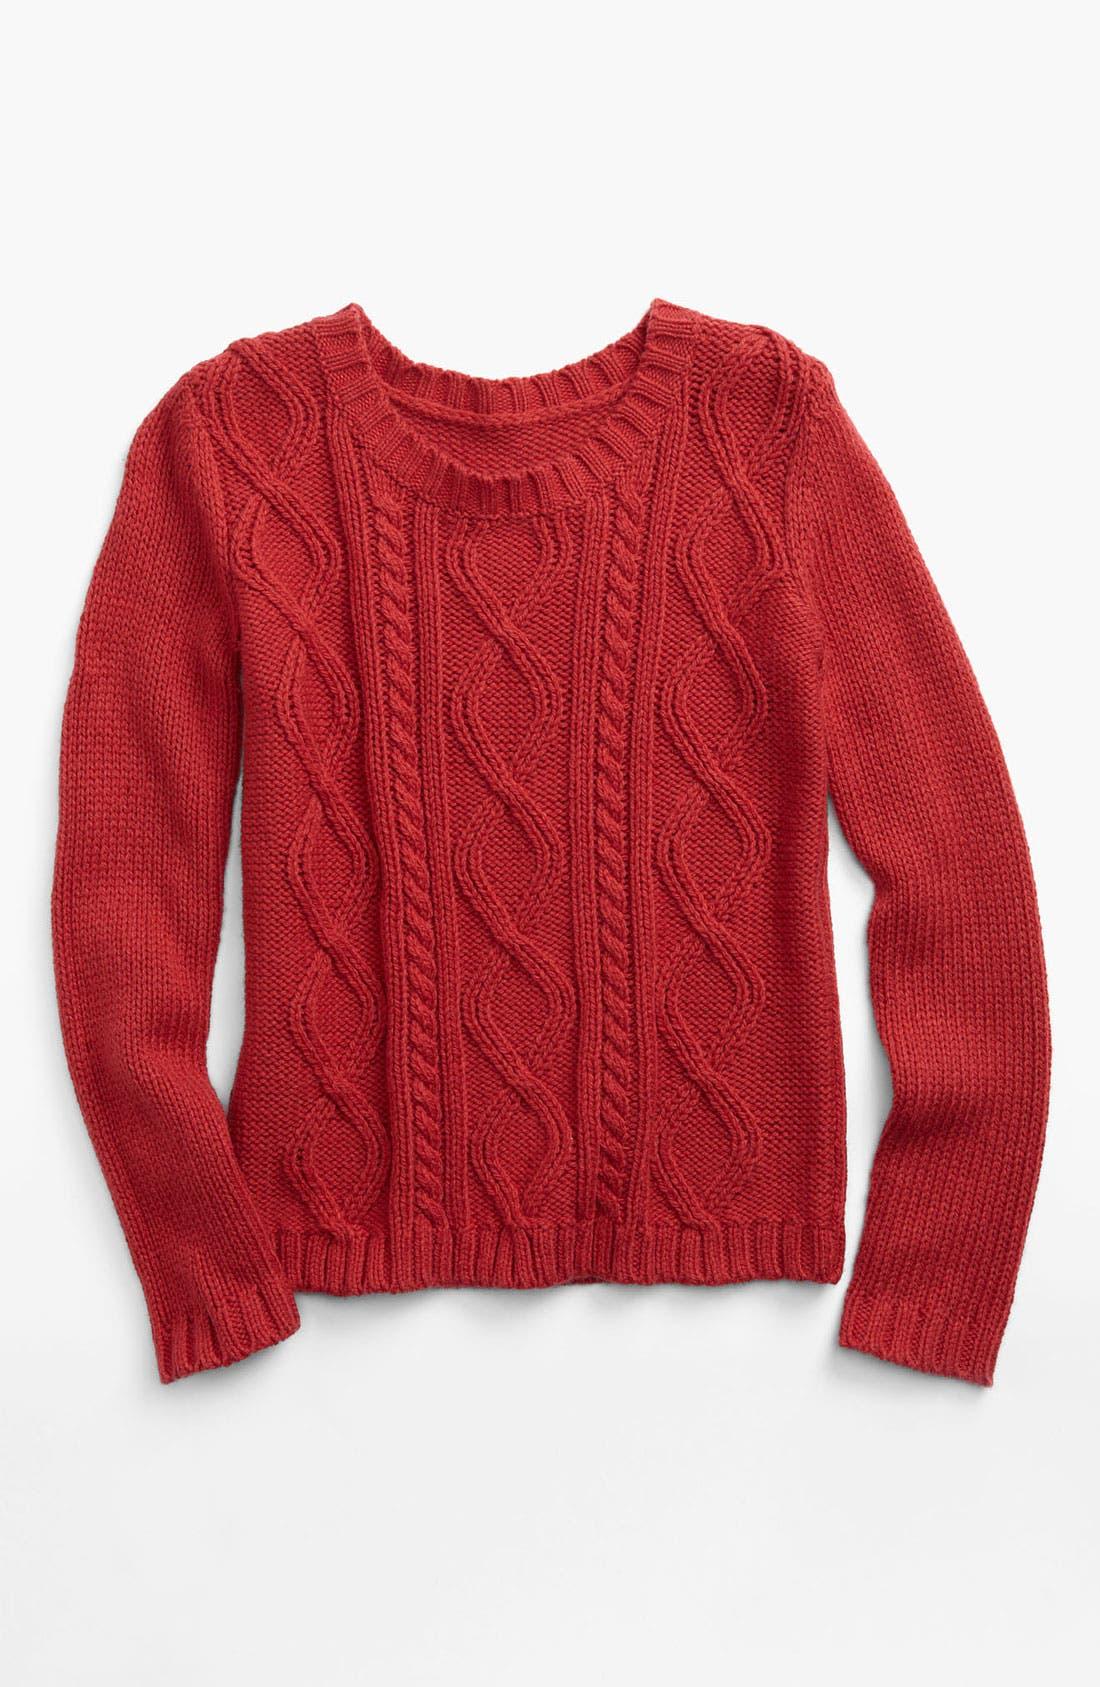 Main Image - Tucker + Tate 'Melody' Cable Knit Sweater (Big Girls)